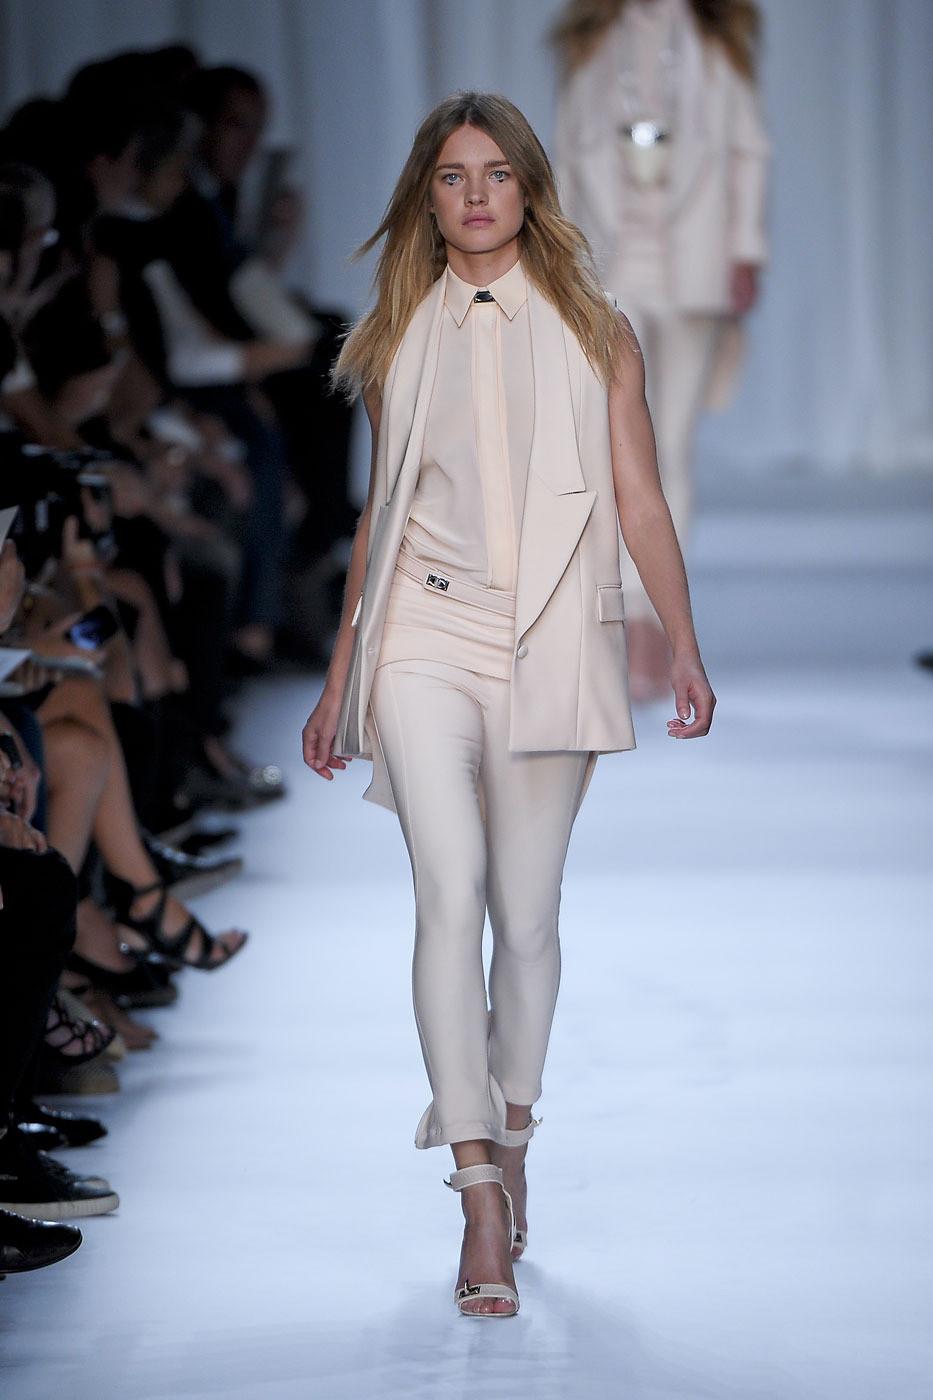 Givenchy Spring 2012 x dv Rn In KYMx